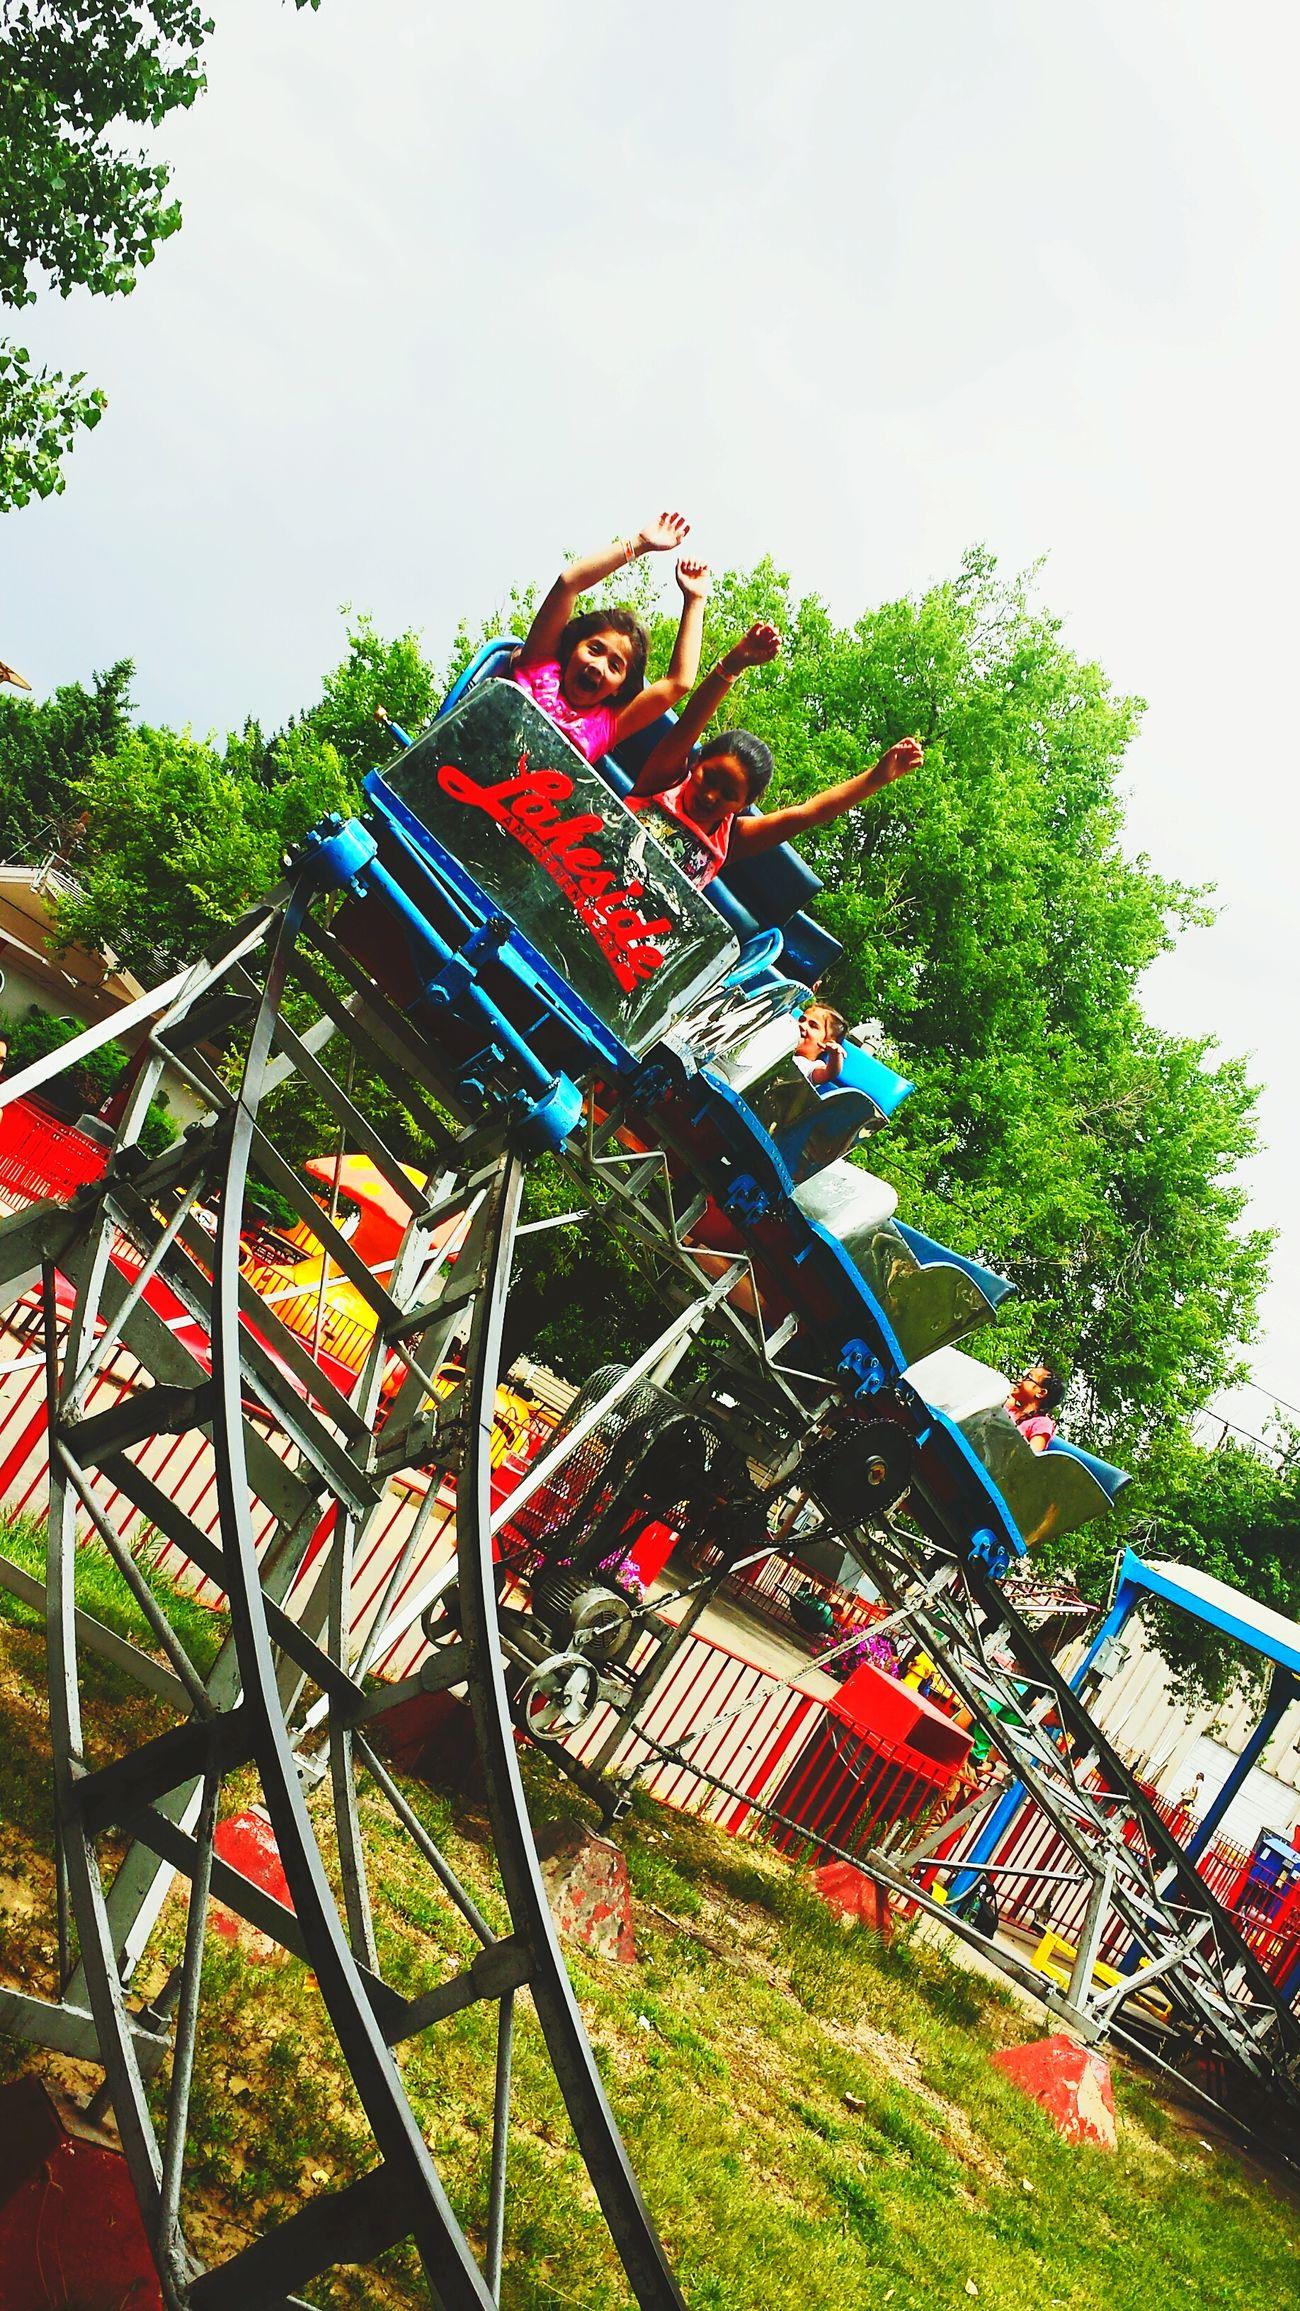 Lakeside Amusement Park Denver,CO Denvertography Colorado Denver 303 720 3oh3 Rollercoaster